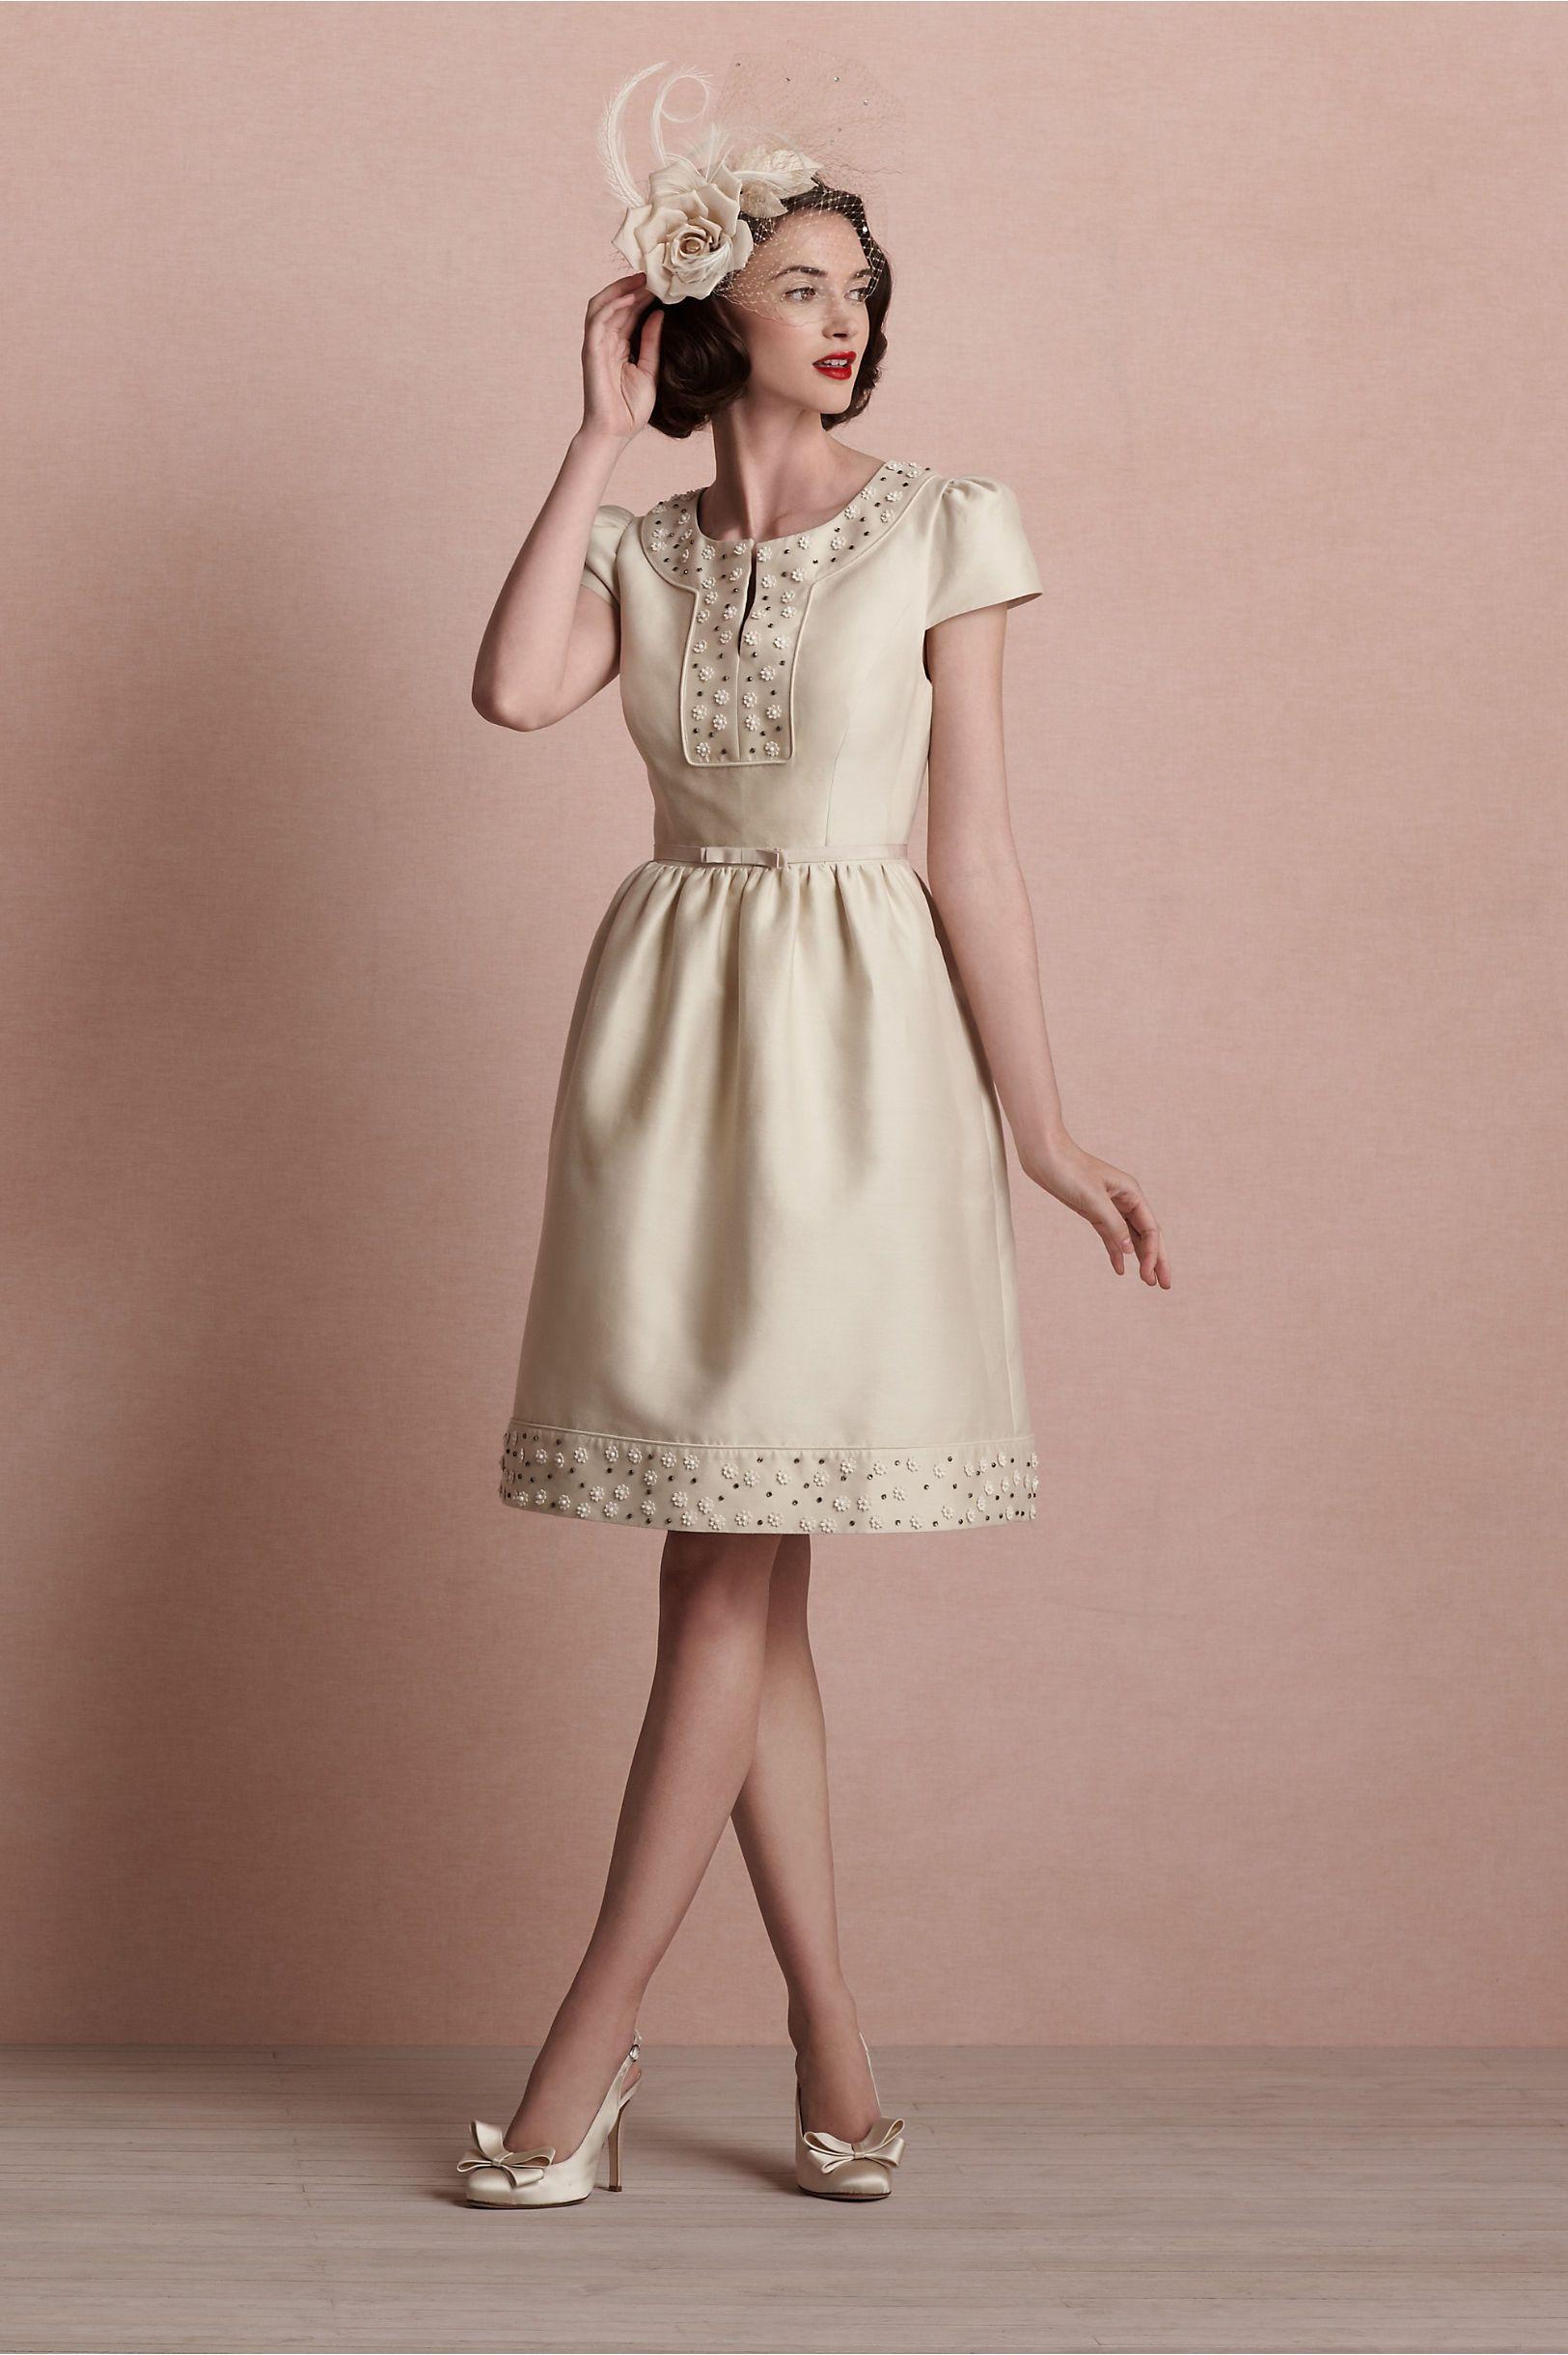 Whirlwind Dress | A Vintage Wedding | Pinterest | Wedding dress ...